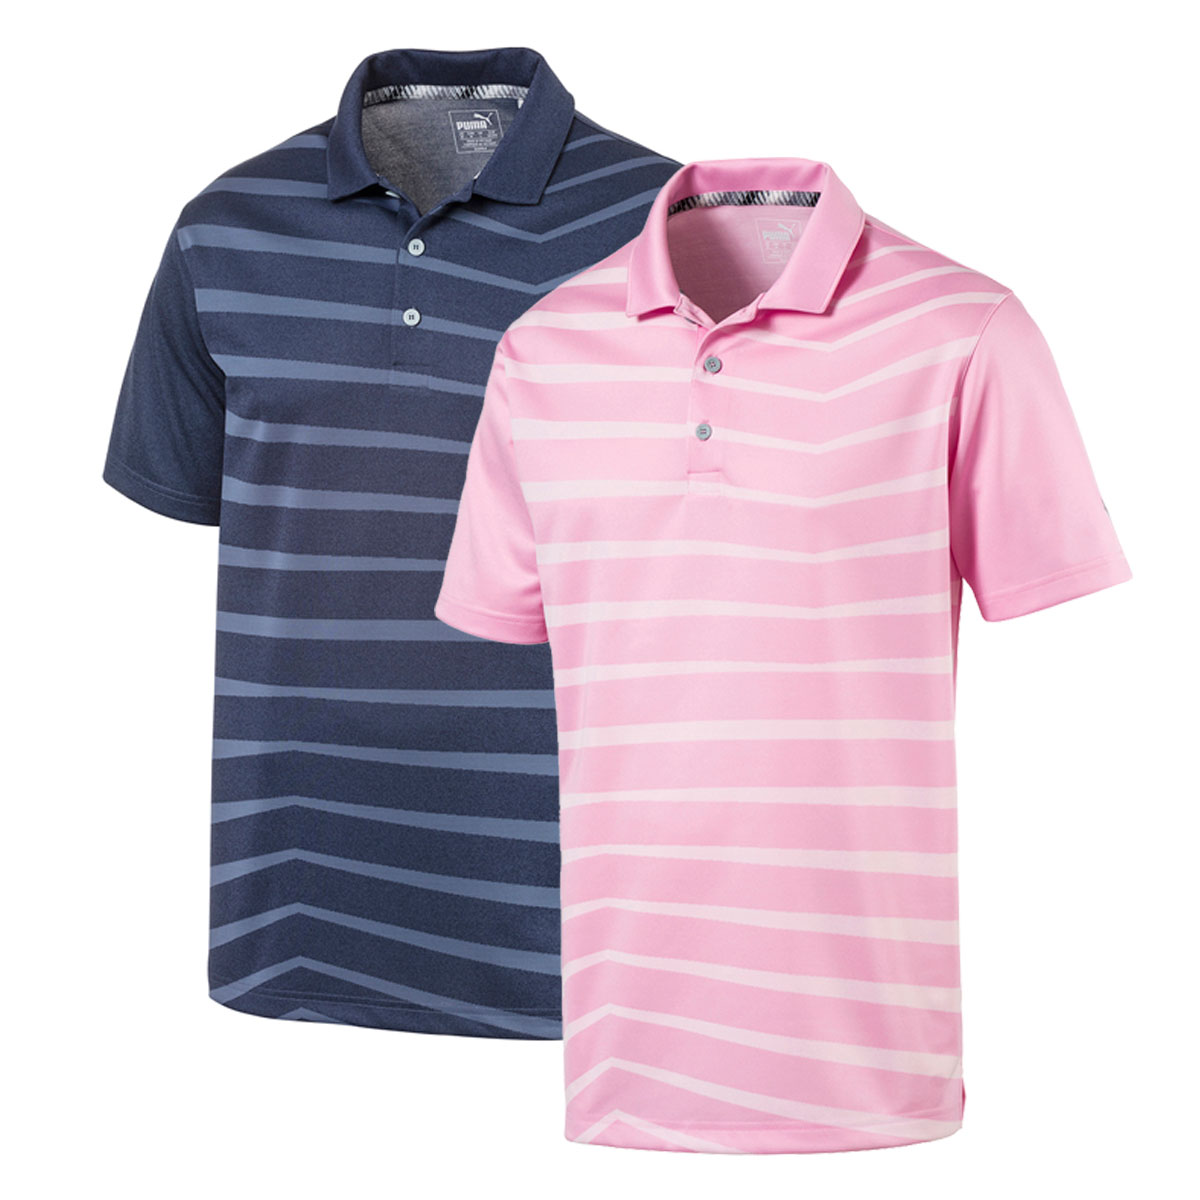 Puma Men's Alterknit Prismatic Golf Polo